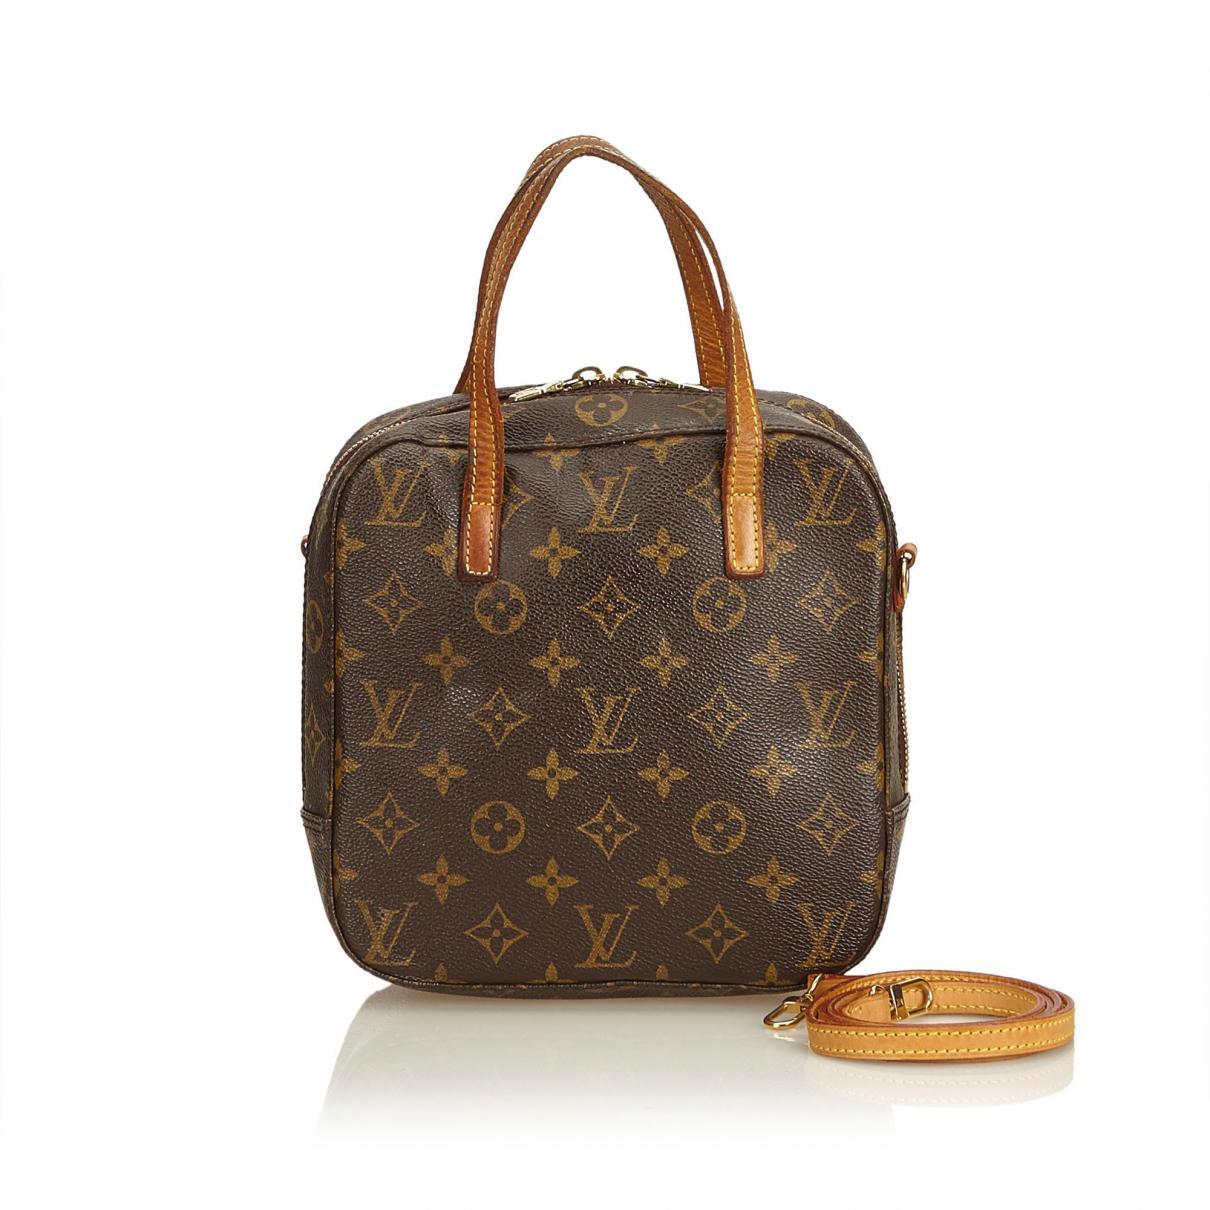 e57df2c6e08 Lyst - Cartable Spontini en toile Louis Vuitton en coloris Marron